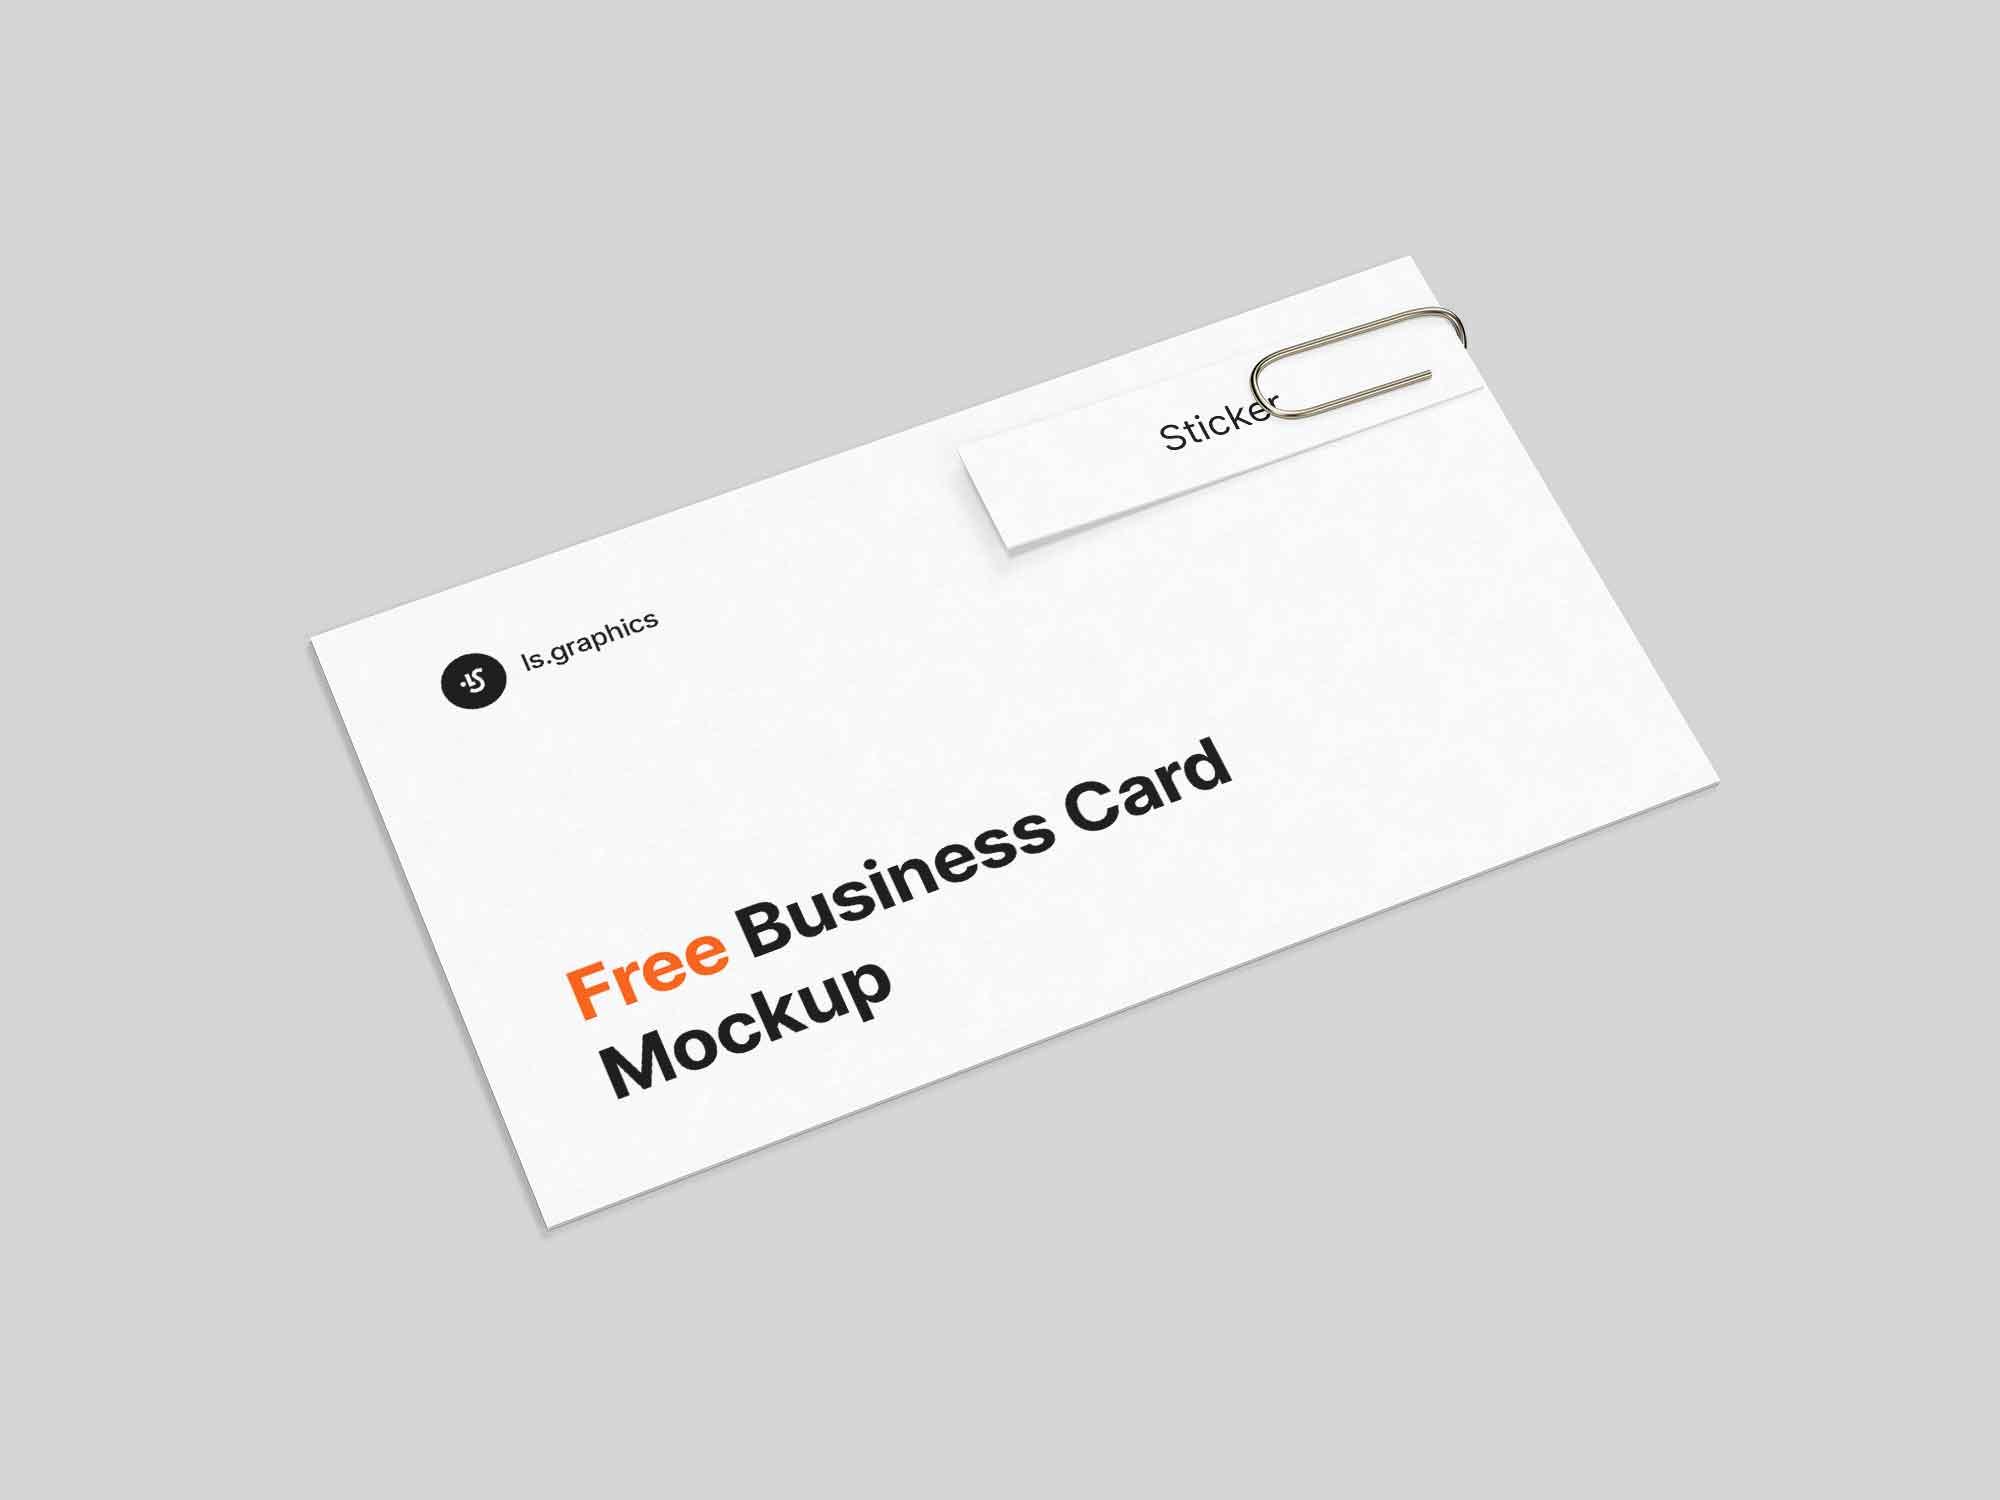 Business Card & Sticker Mockup